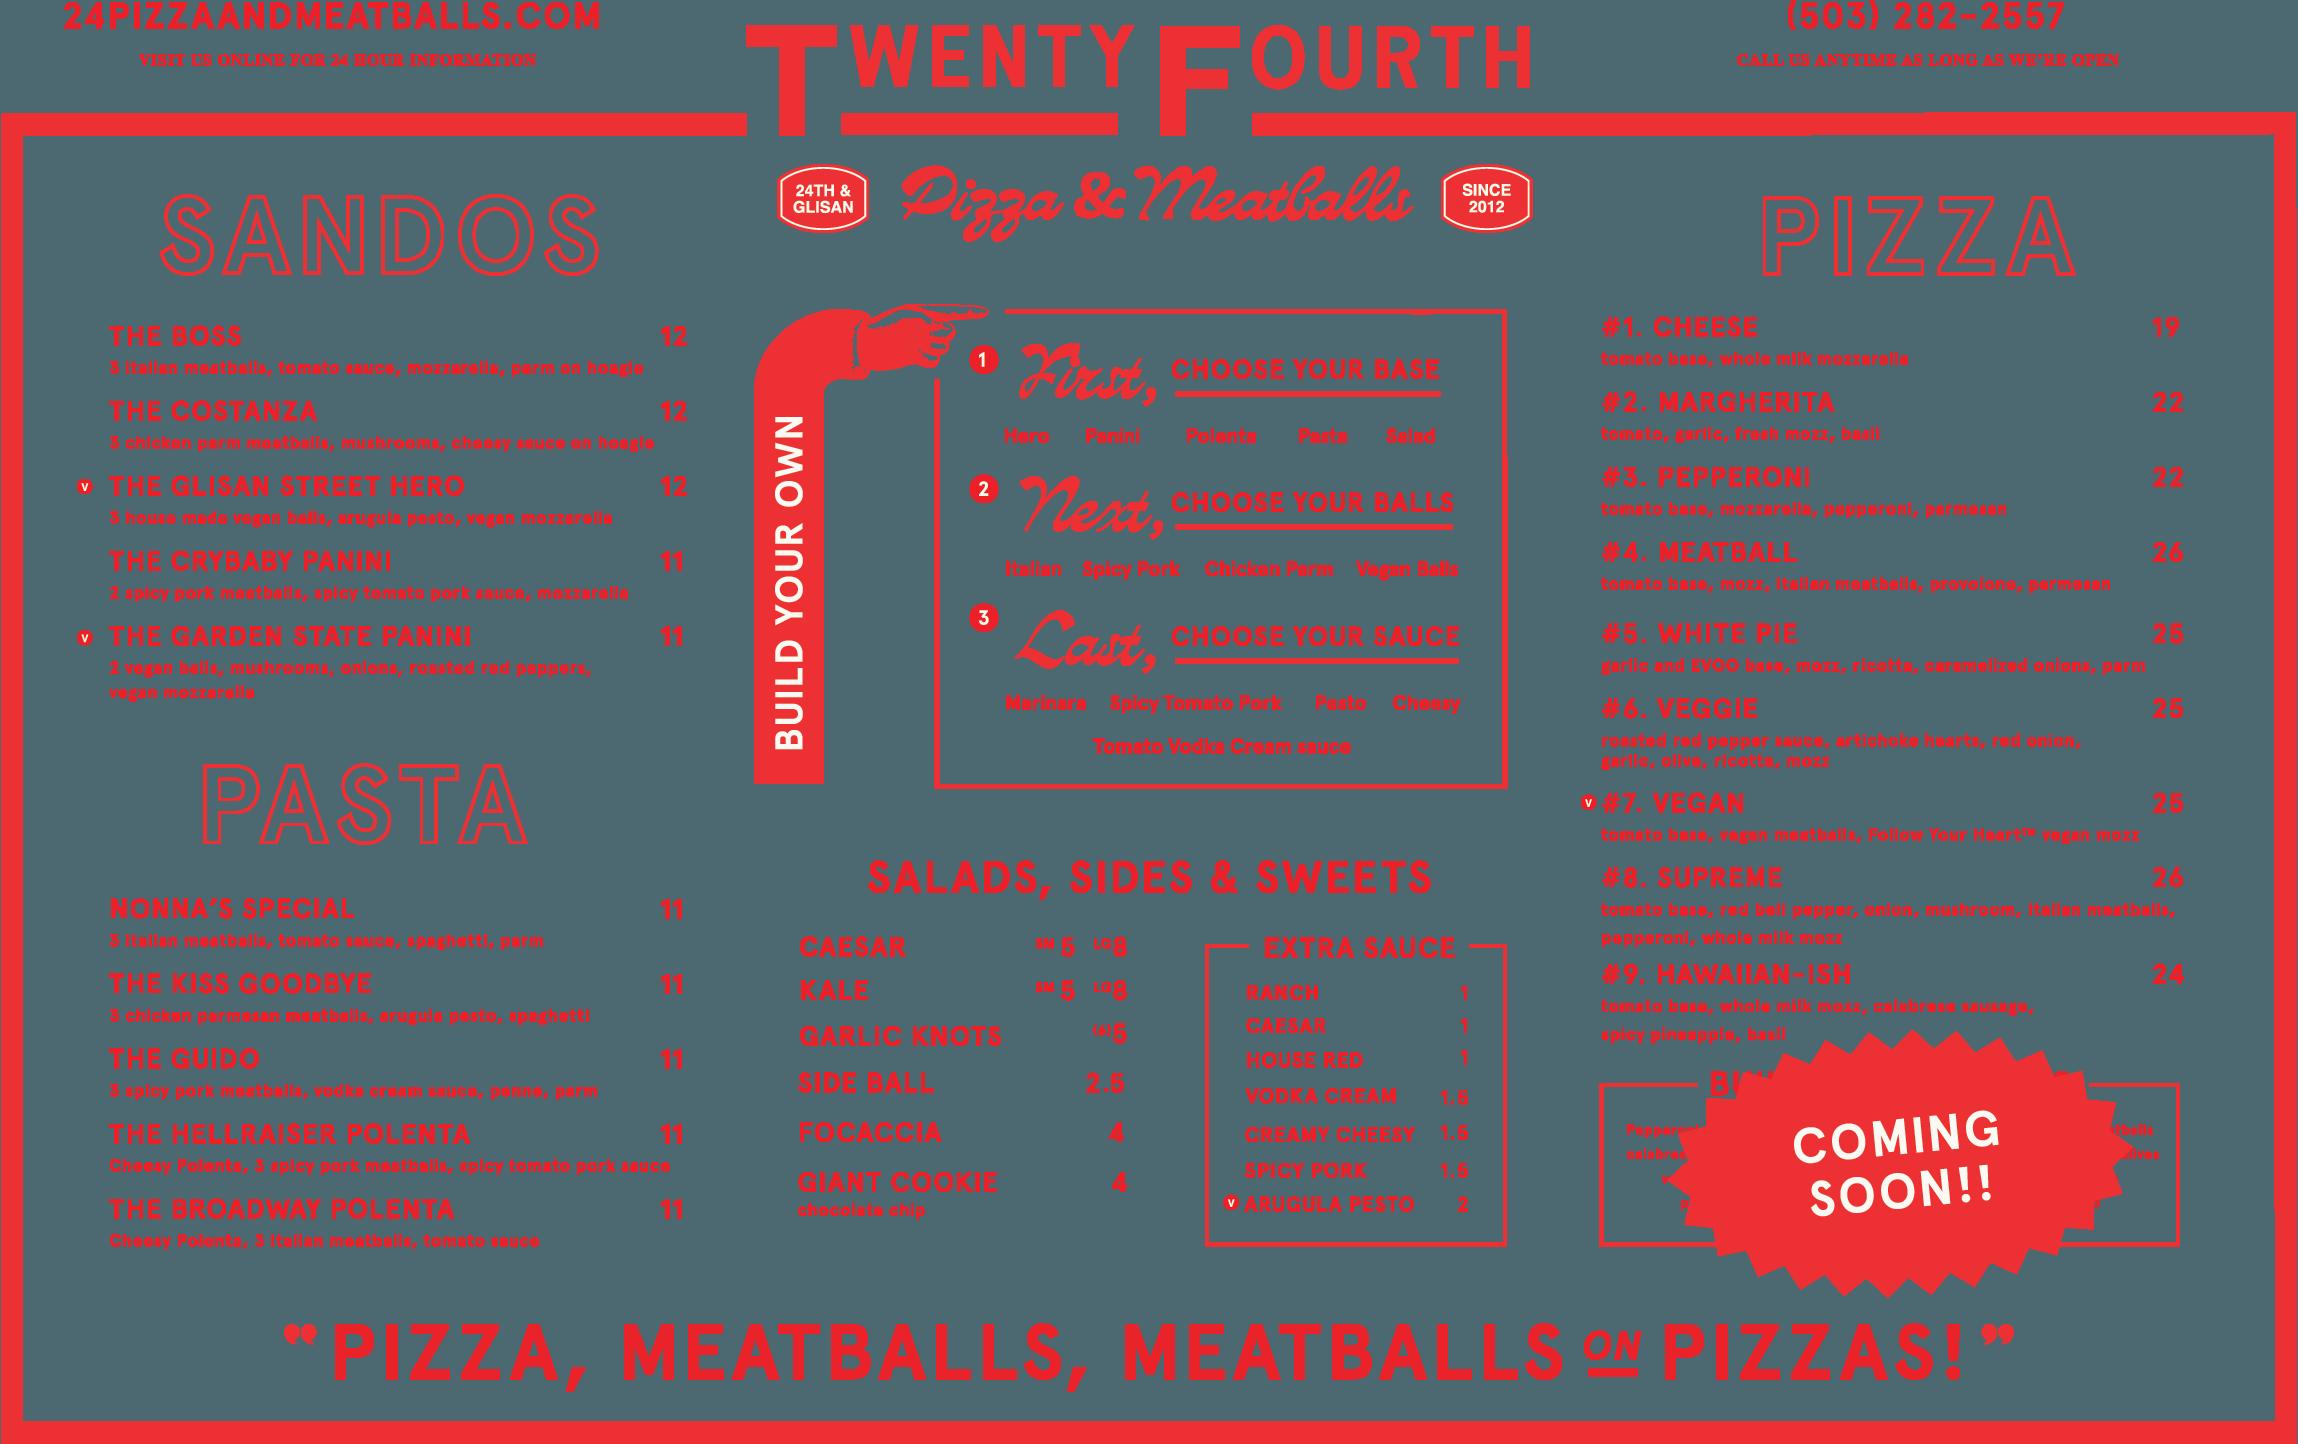 twenty fourth pizza and meatballs menu graphic